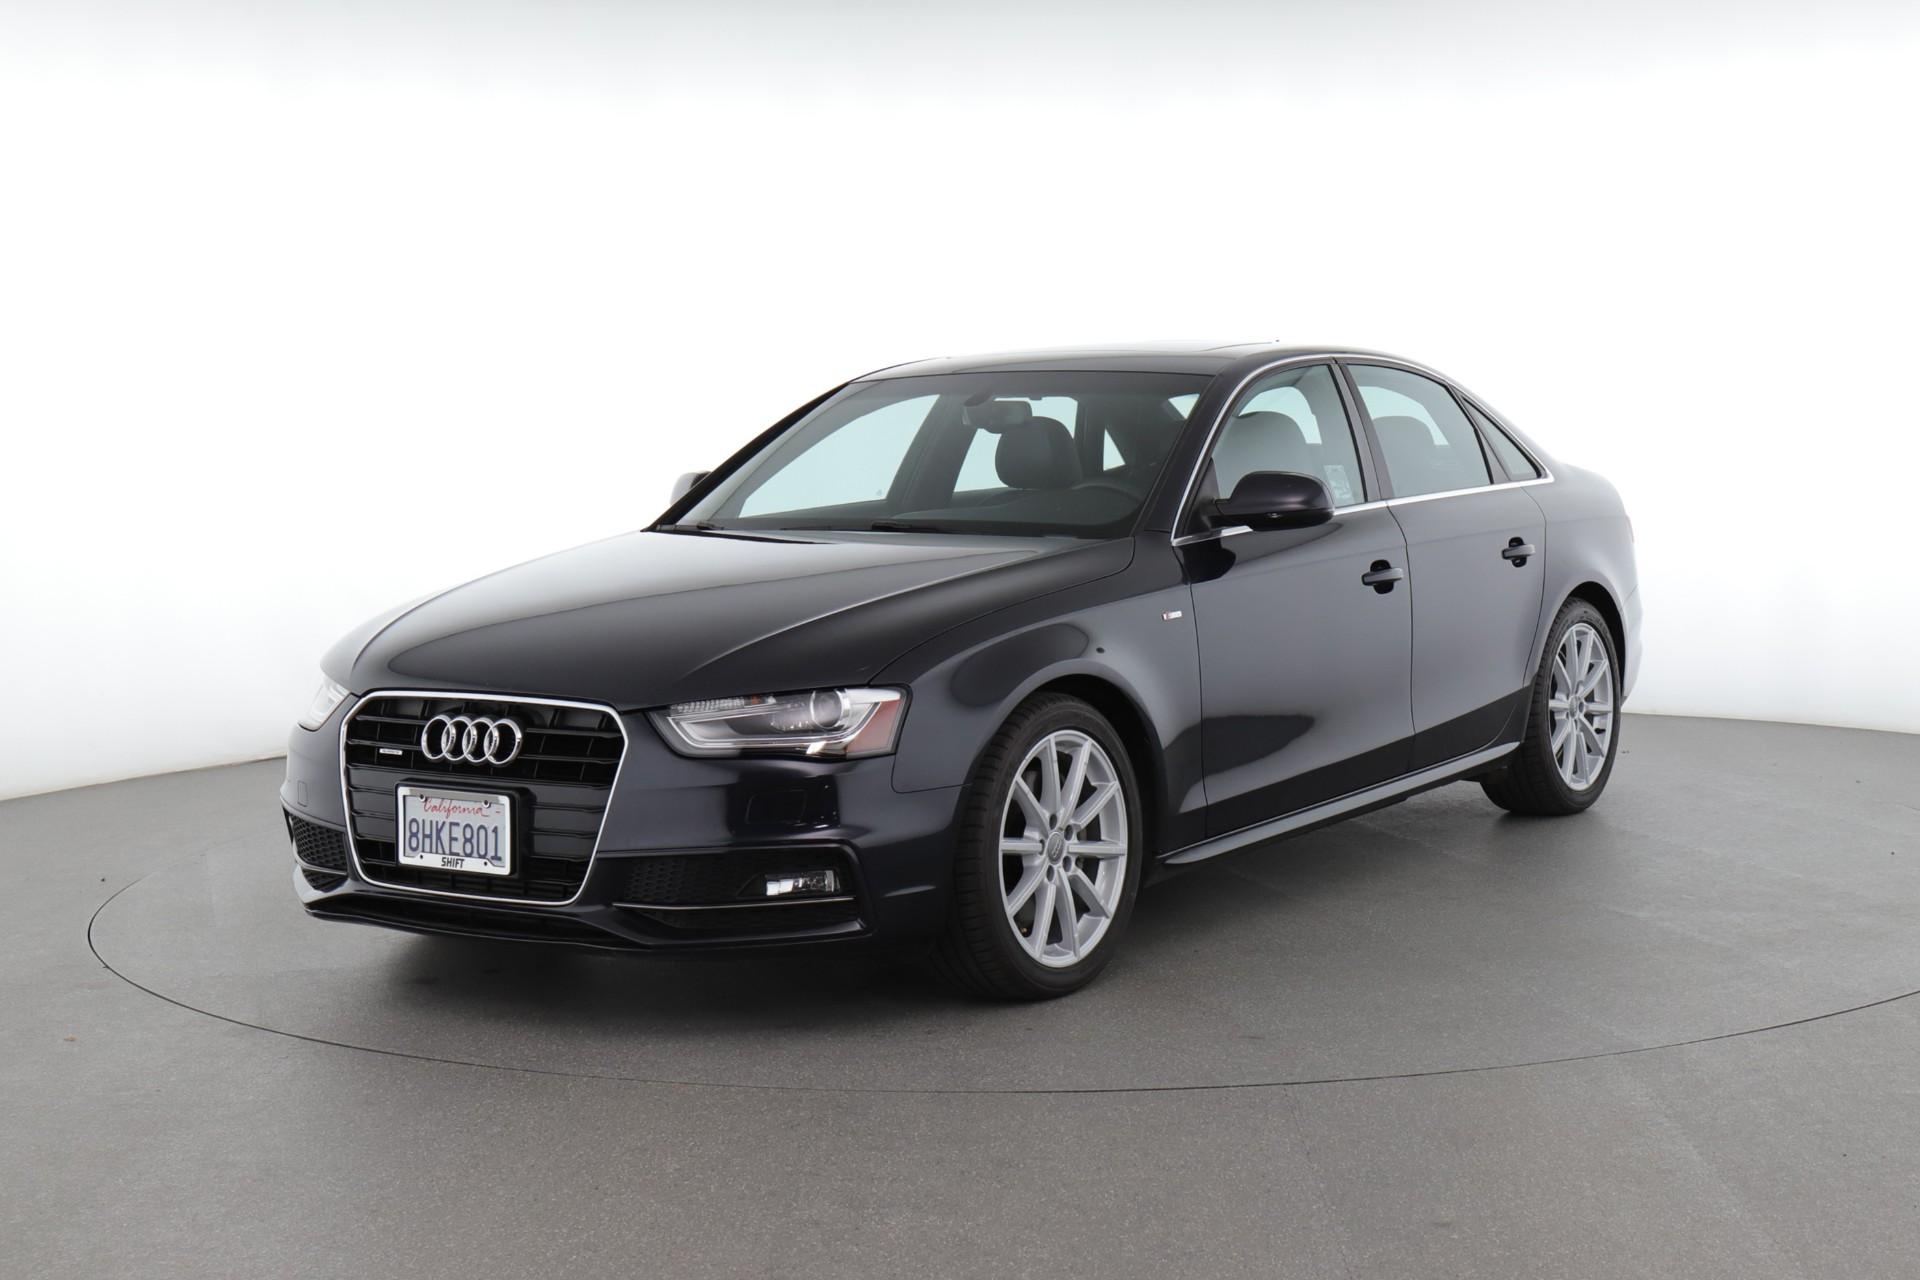 2014 Audi A4 Prestige (from $17,400)